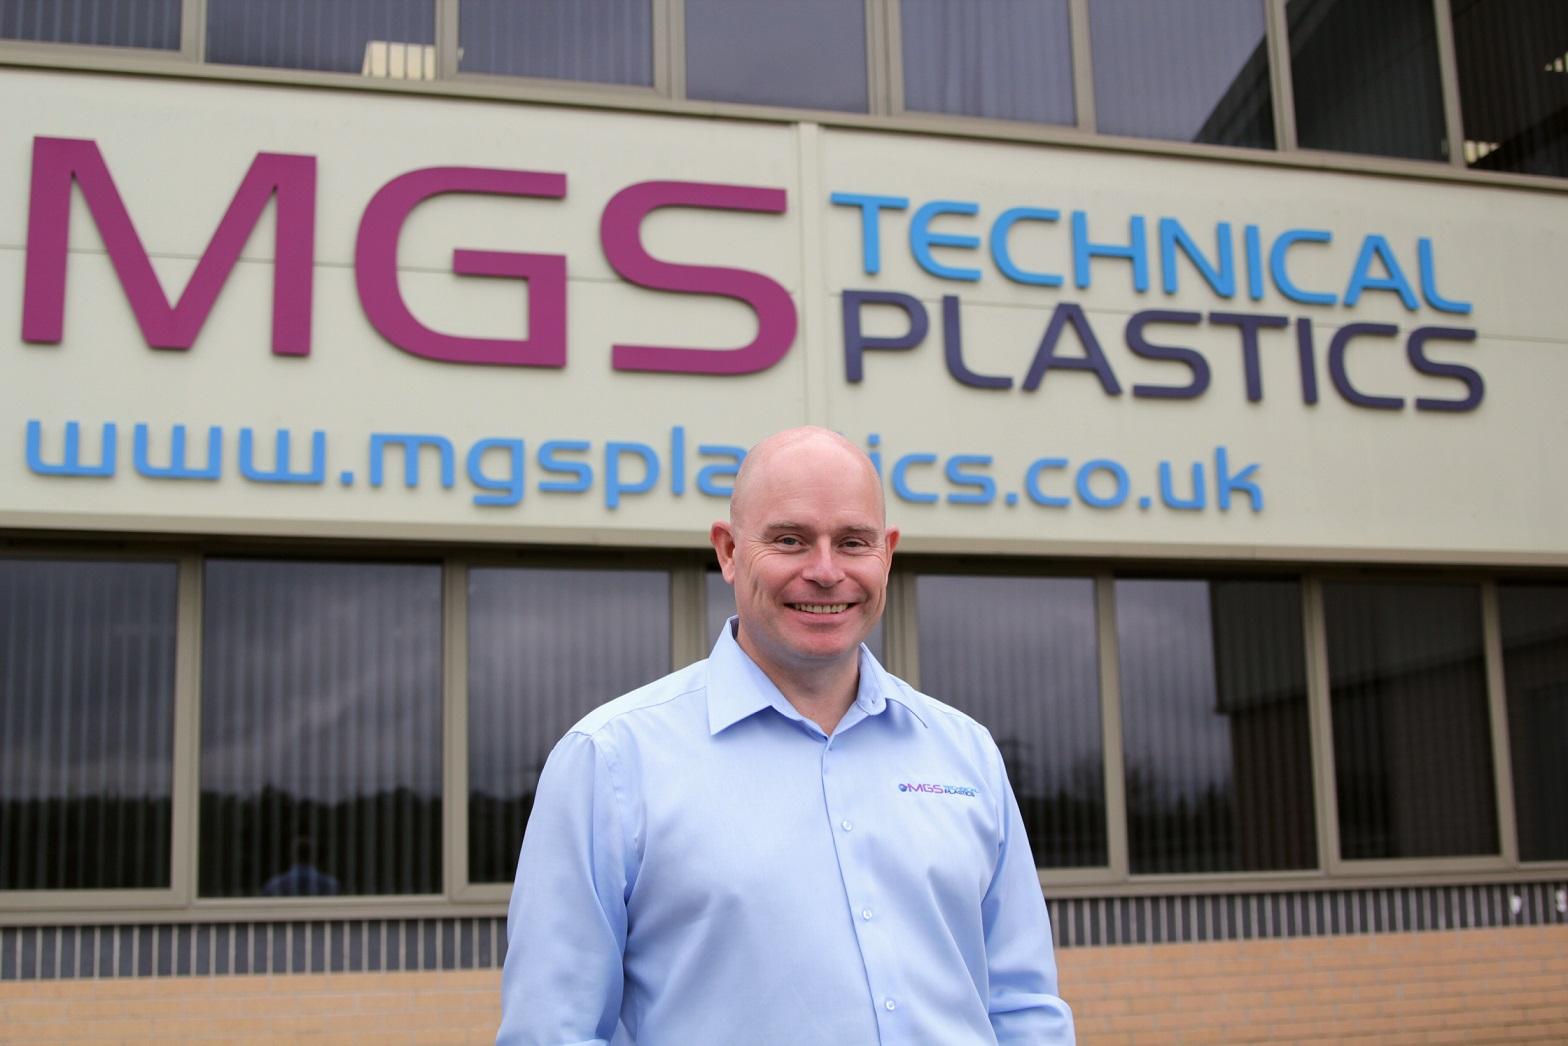 Mark Preston, Sales Director, standing in front of MGS Technical Plastics Ltd.